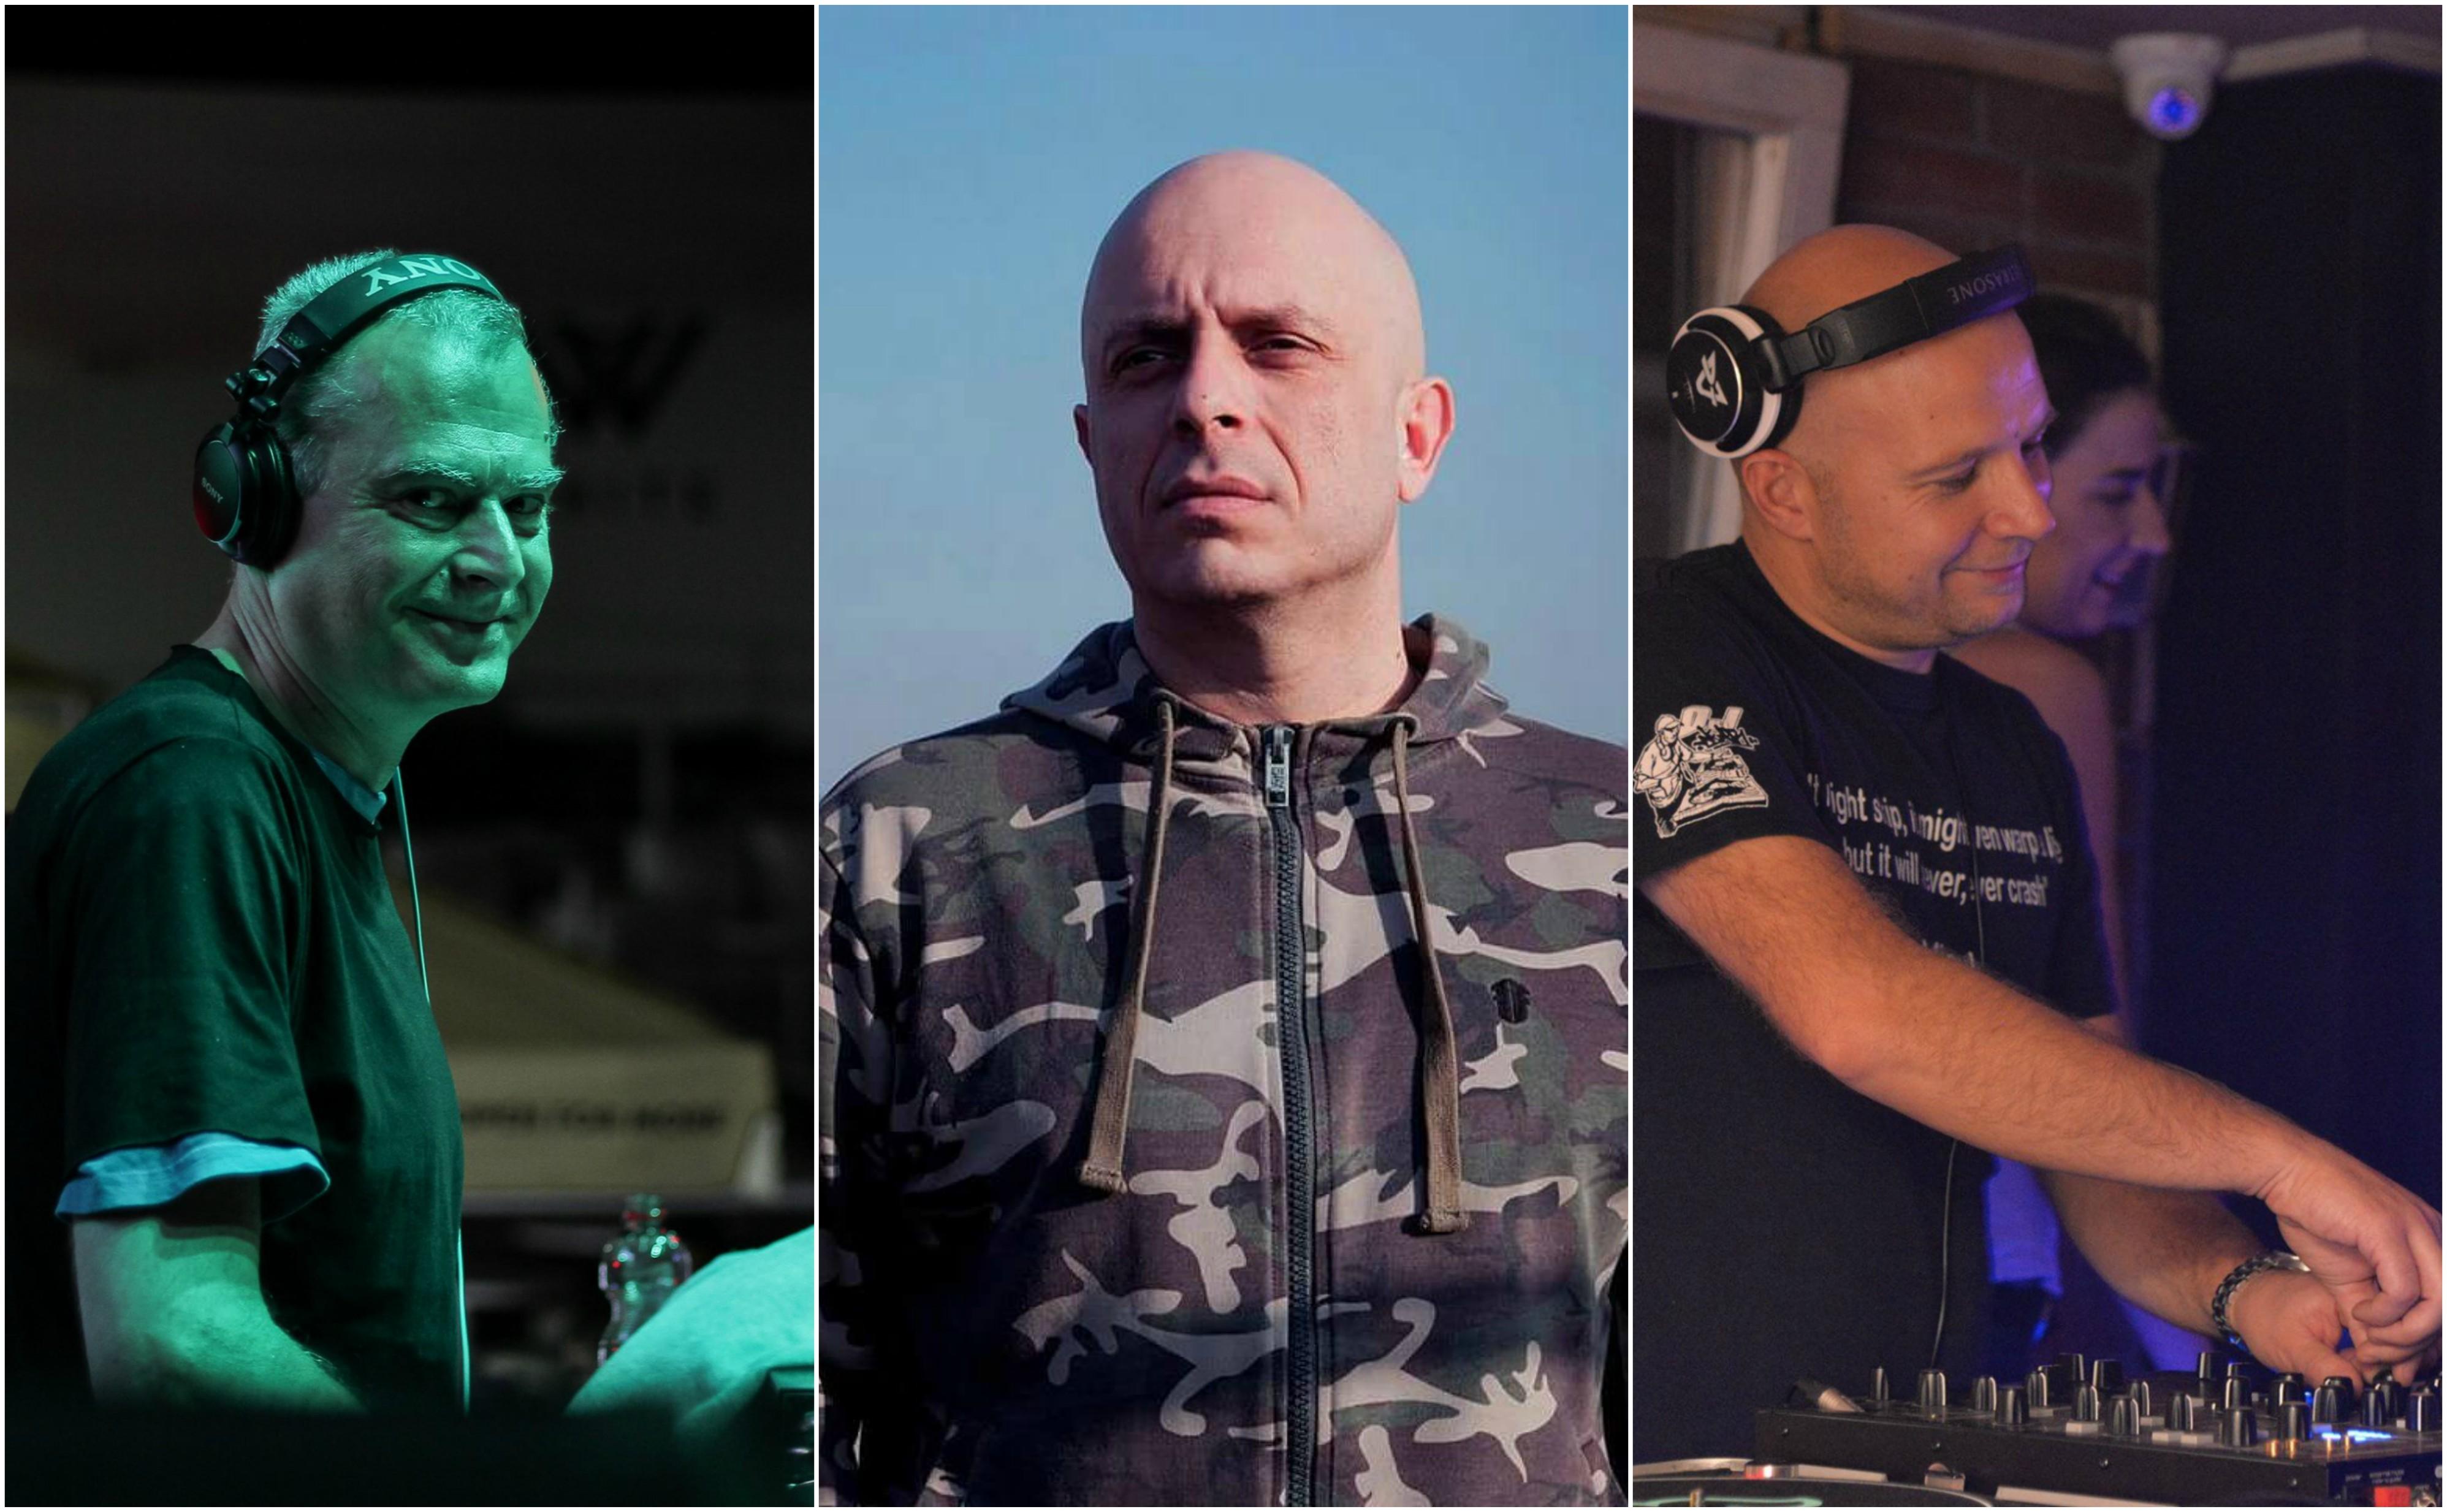 Boža Podunavac - Mirko Lazarević - Dušan Kačarević - Drugstore